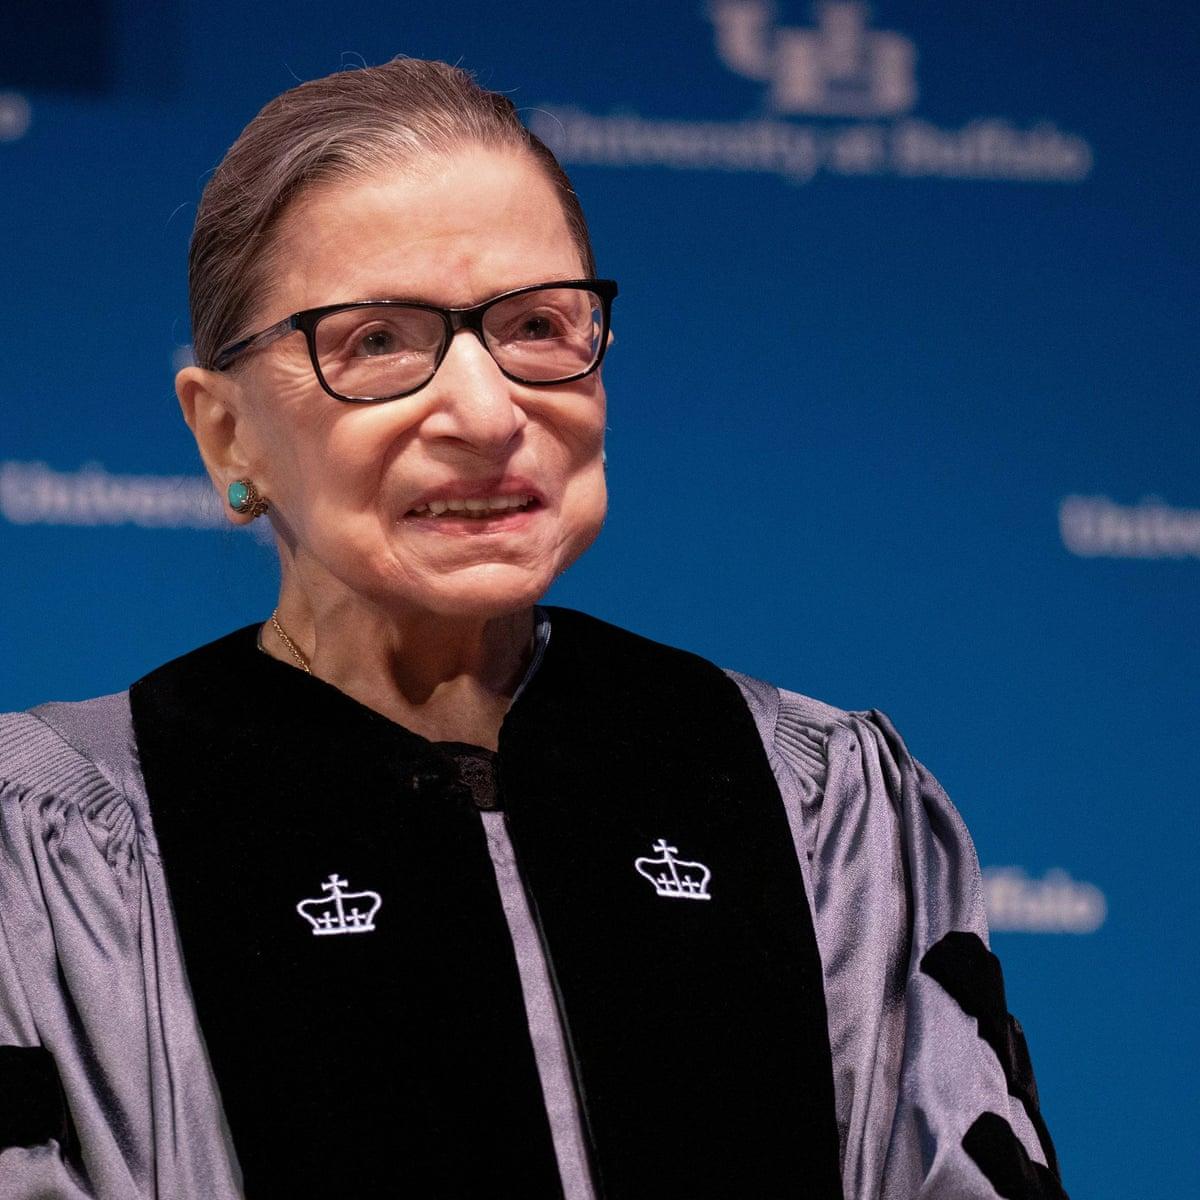 Ruth Bader Ginsburg Leaves Hospital And Doing Well At Home Ruth Bader Ginsburg The Guardian